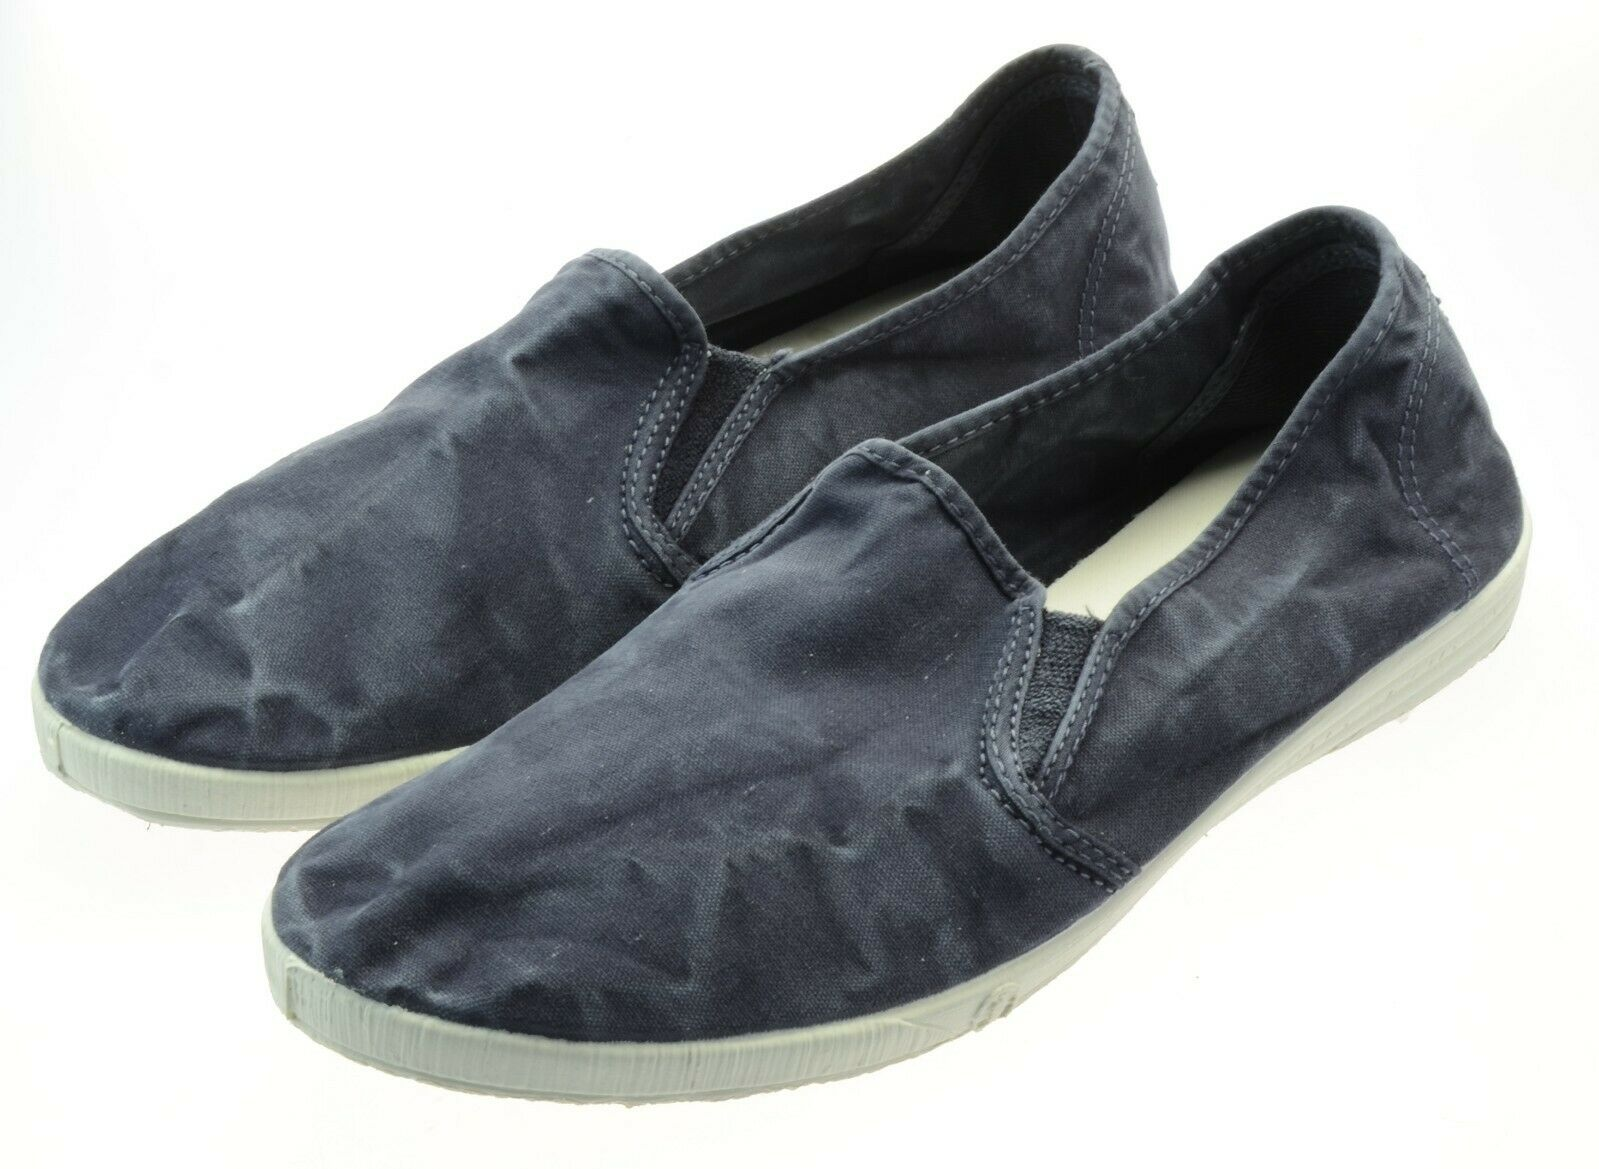 Natural World Schuhe 315E 677 MARINO ENZ BLAU Bio-Baumwolle Waschbar MadeinSpain